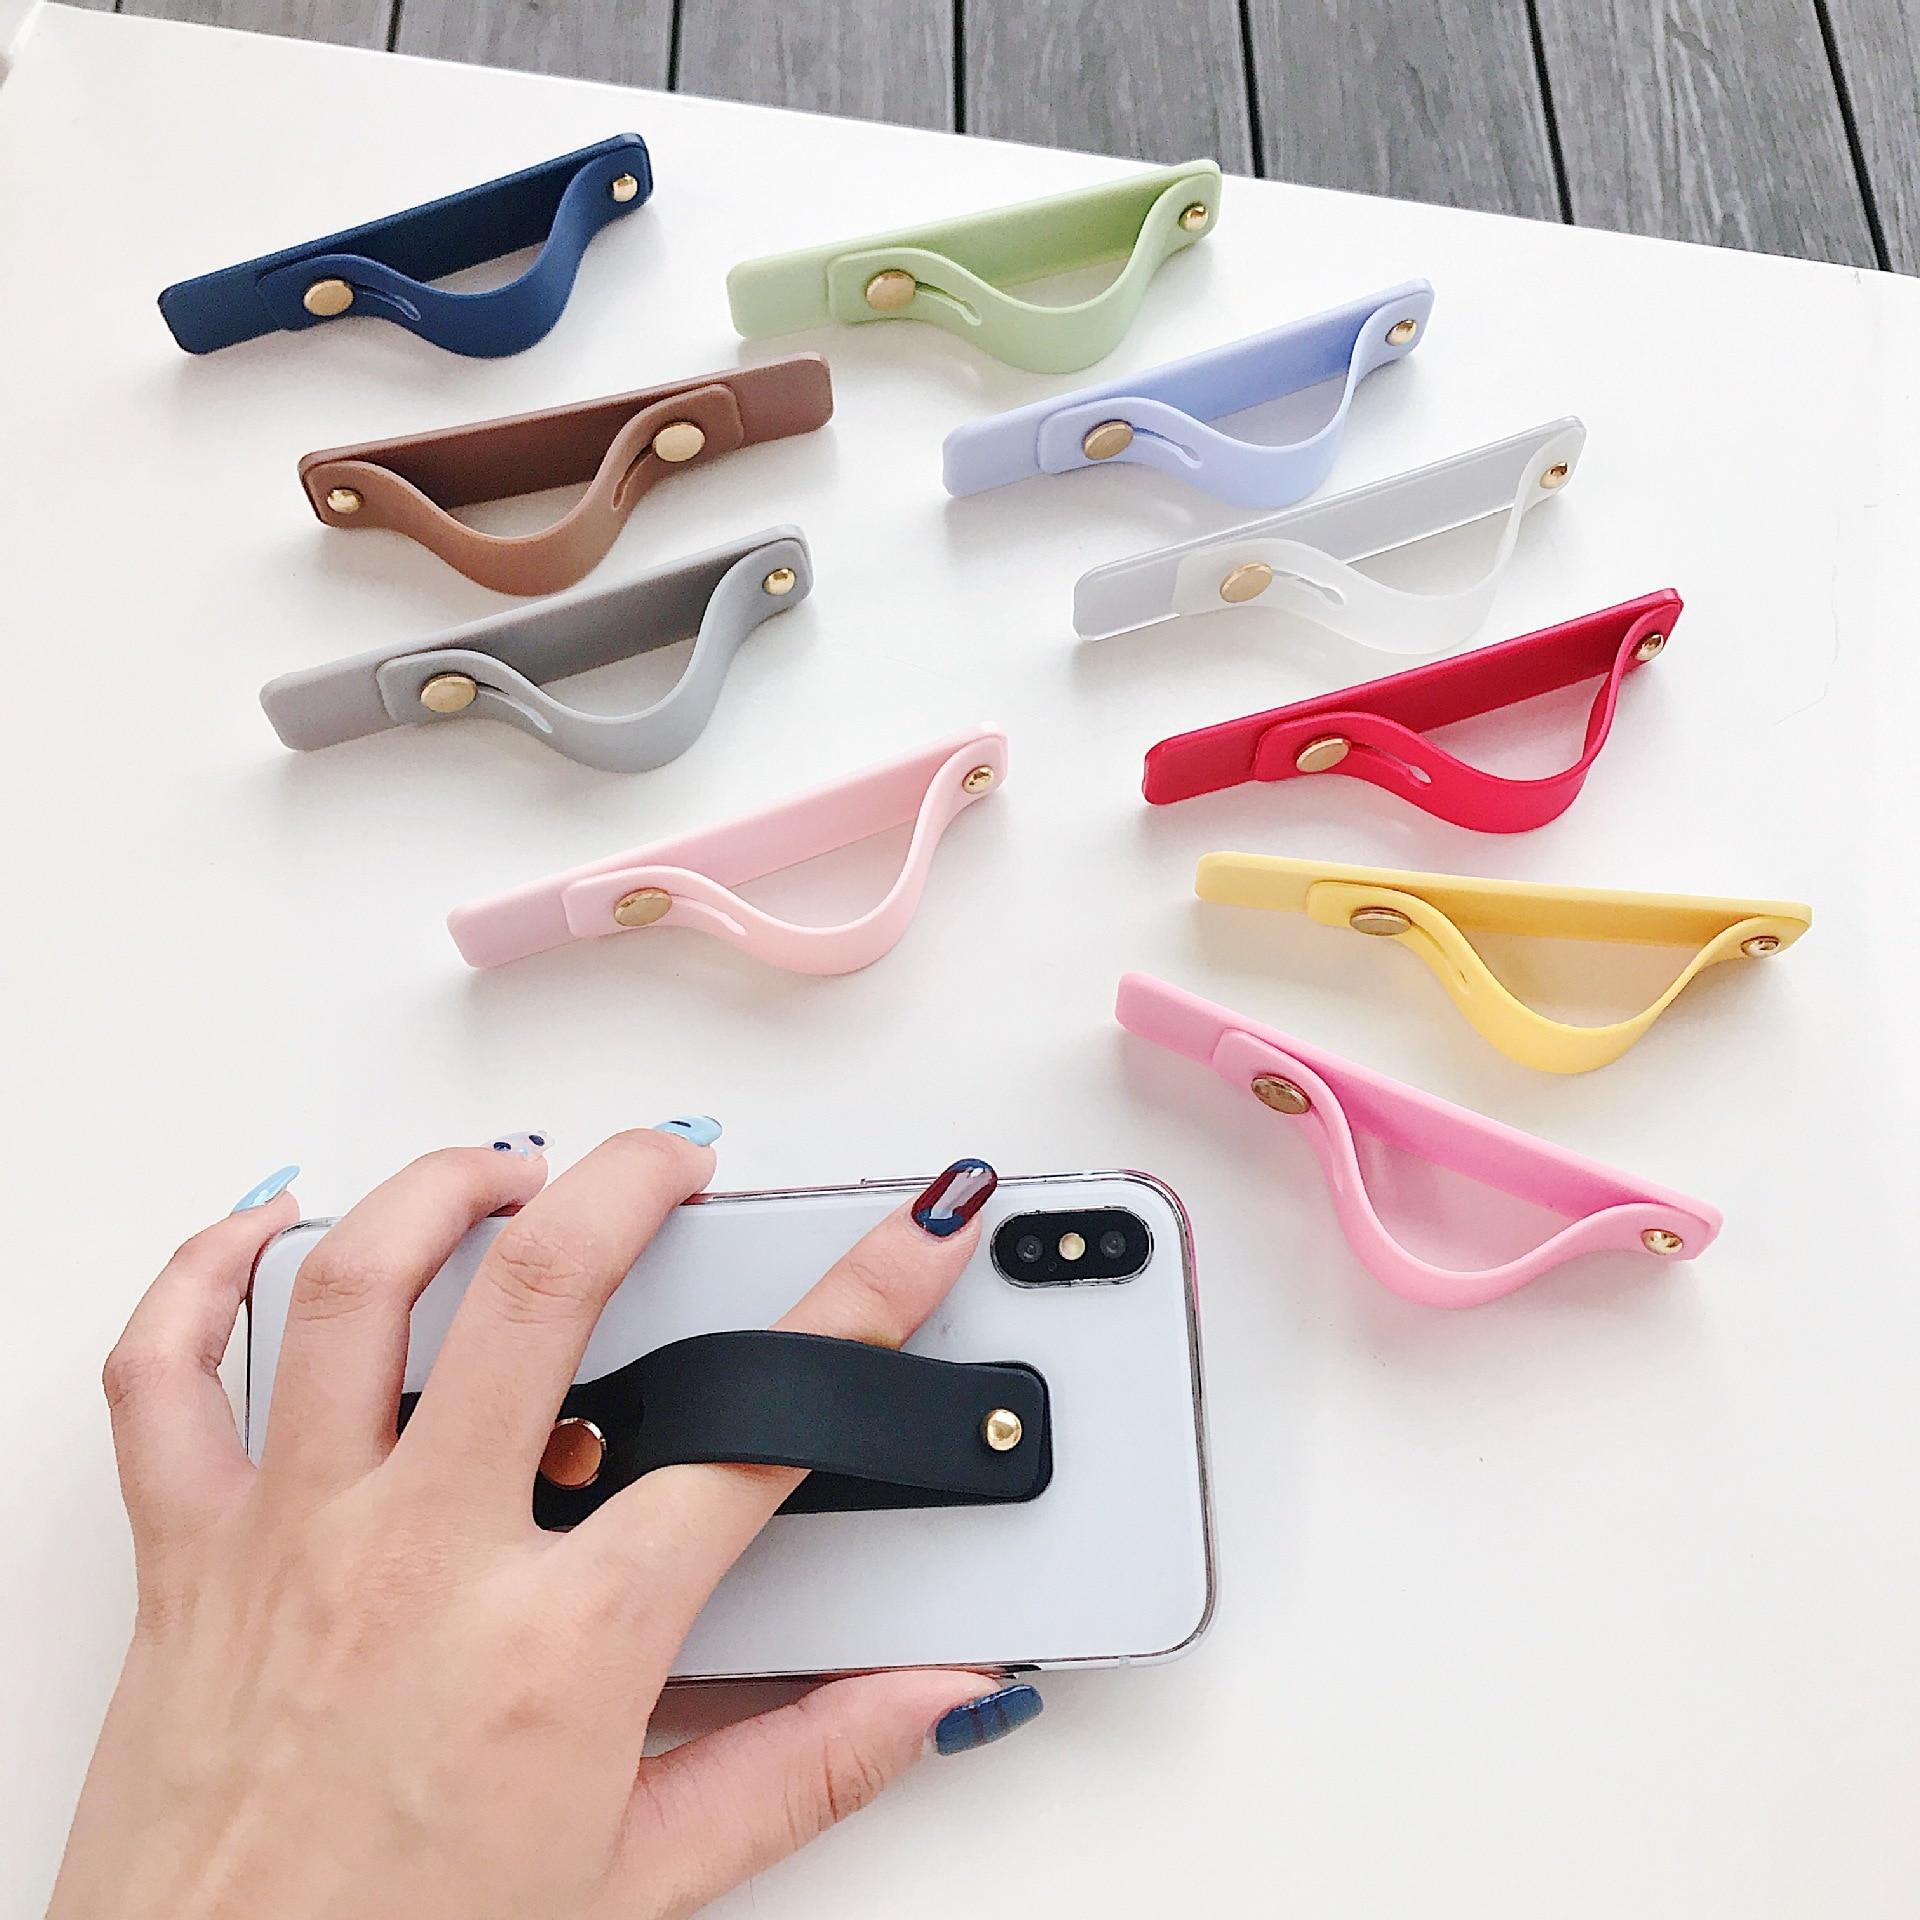 Plain Color Wrist Band Hand Band Finger Grip Mobile Phone Holder Stand Push Pull Universal Phone Socket Holder For Ring Holder